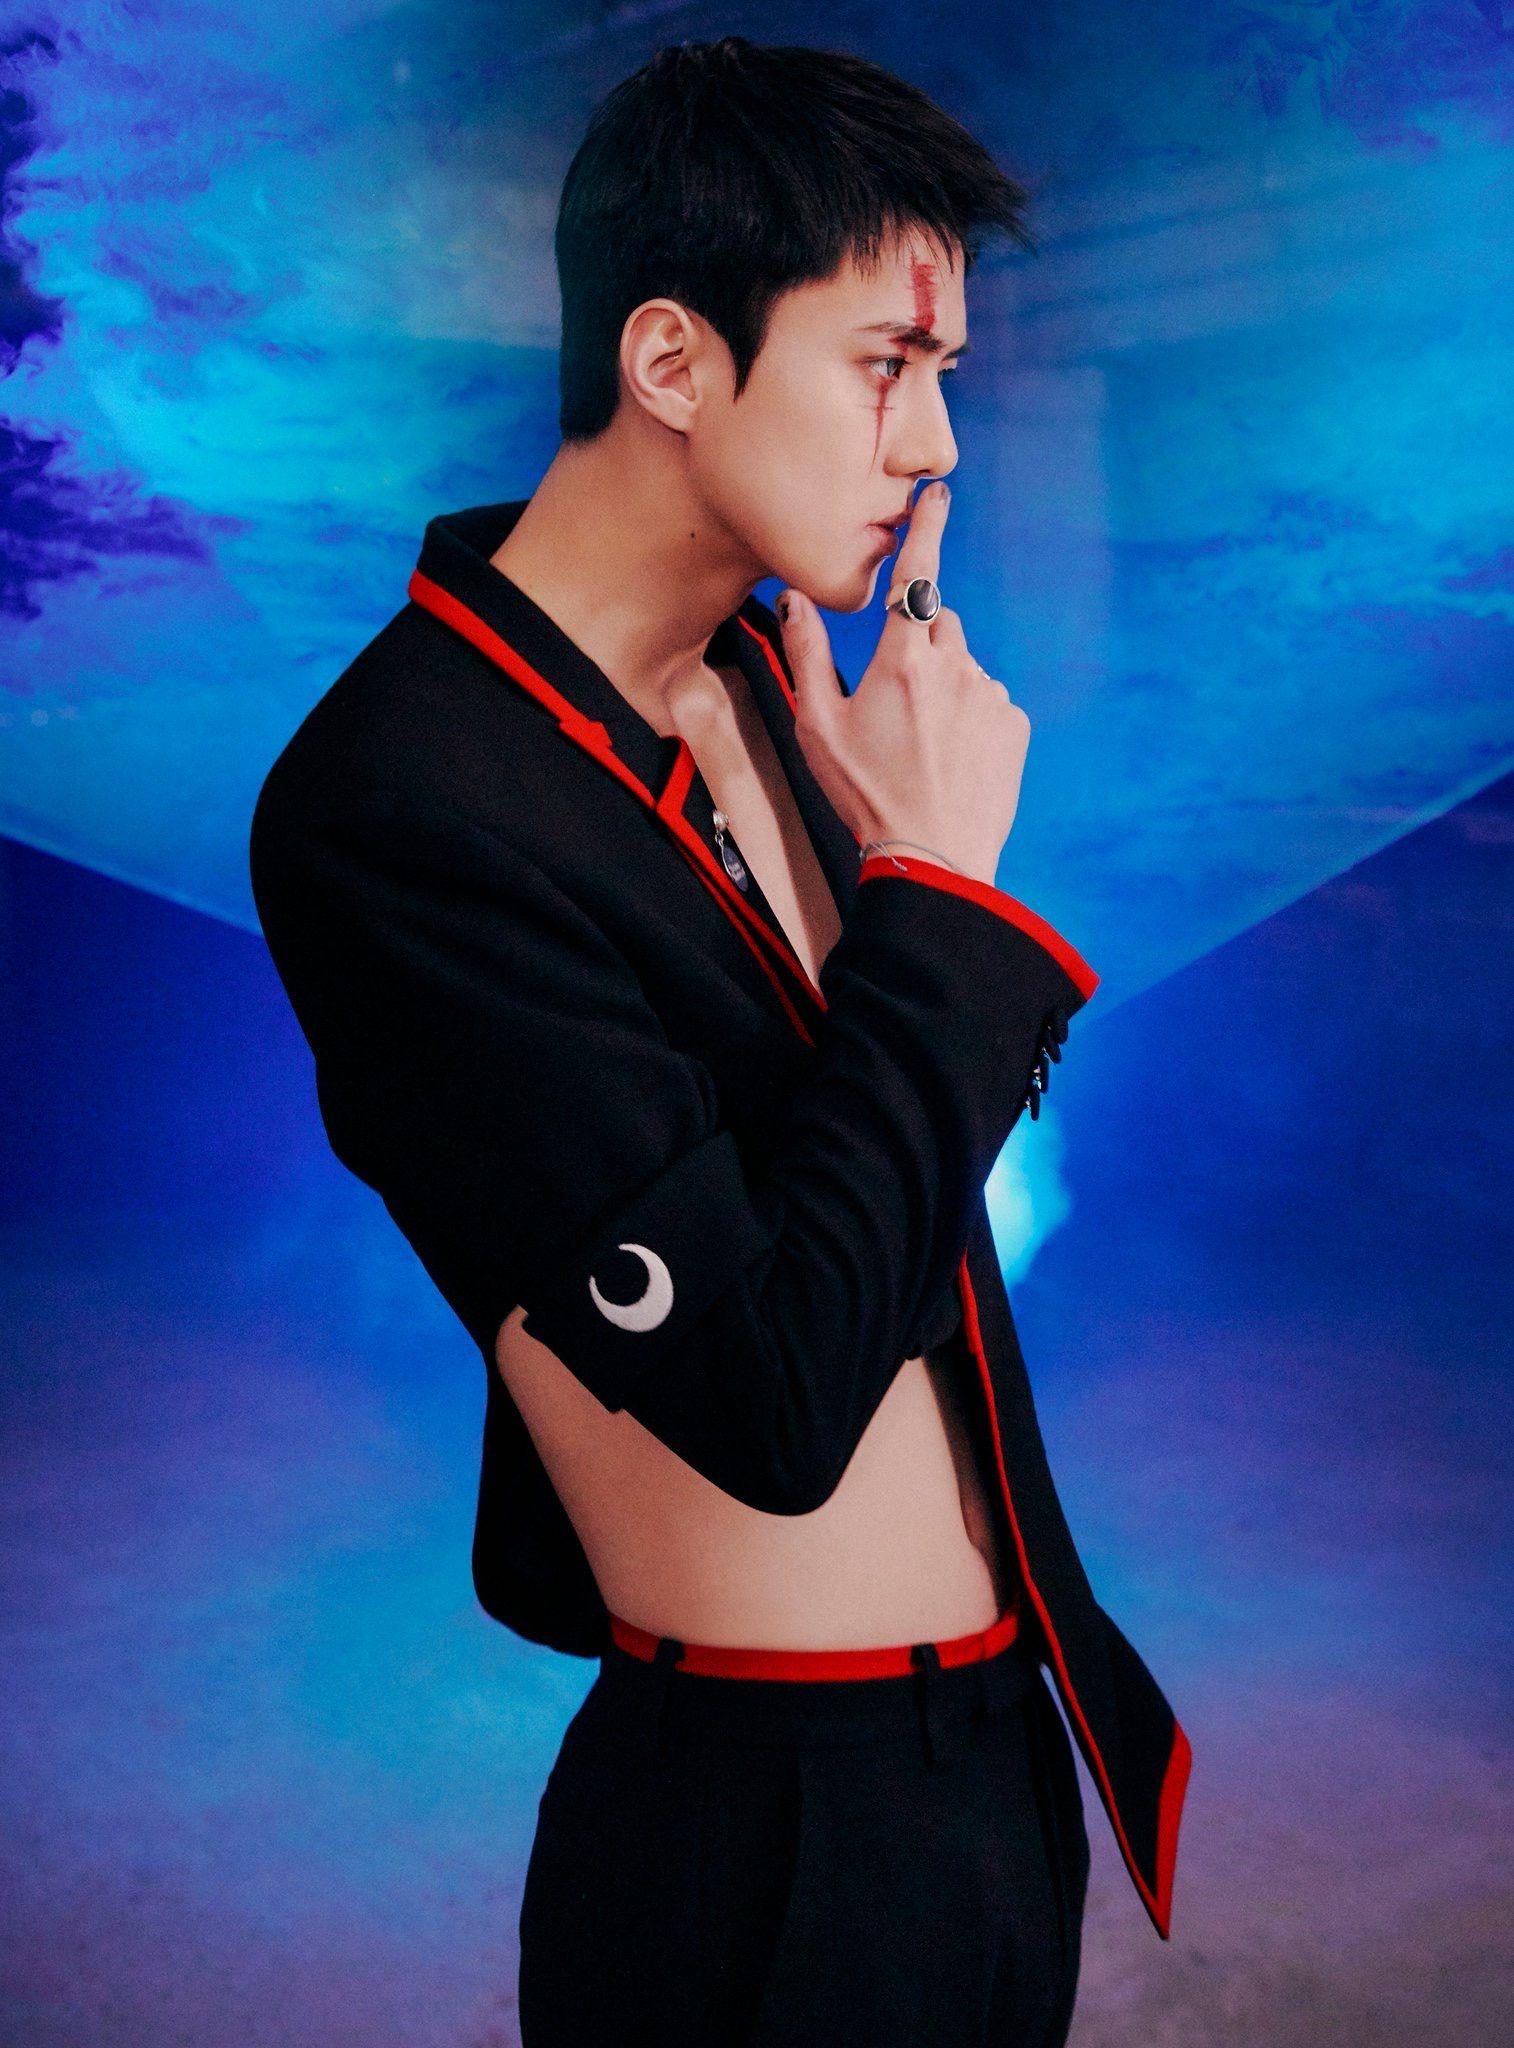 X-EXO 엑스-엑소 Concept Teaser Image #SEHUN   #exoobsession